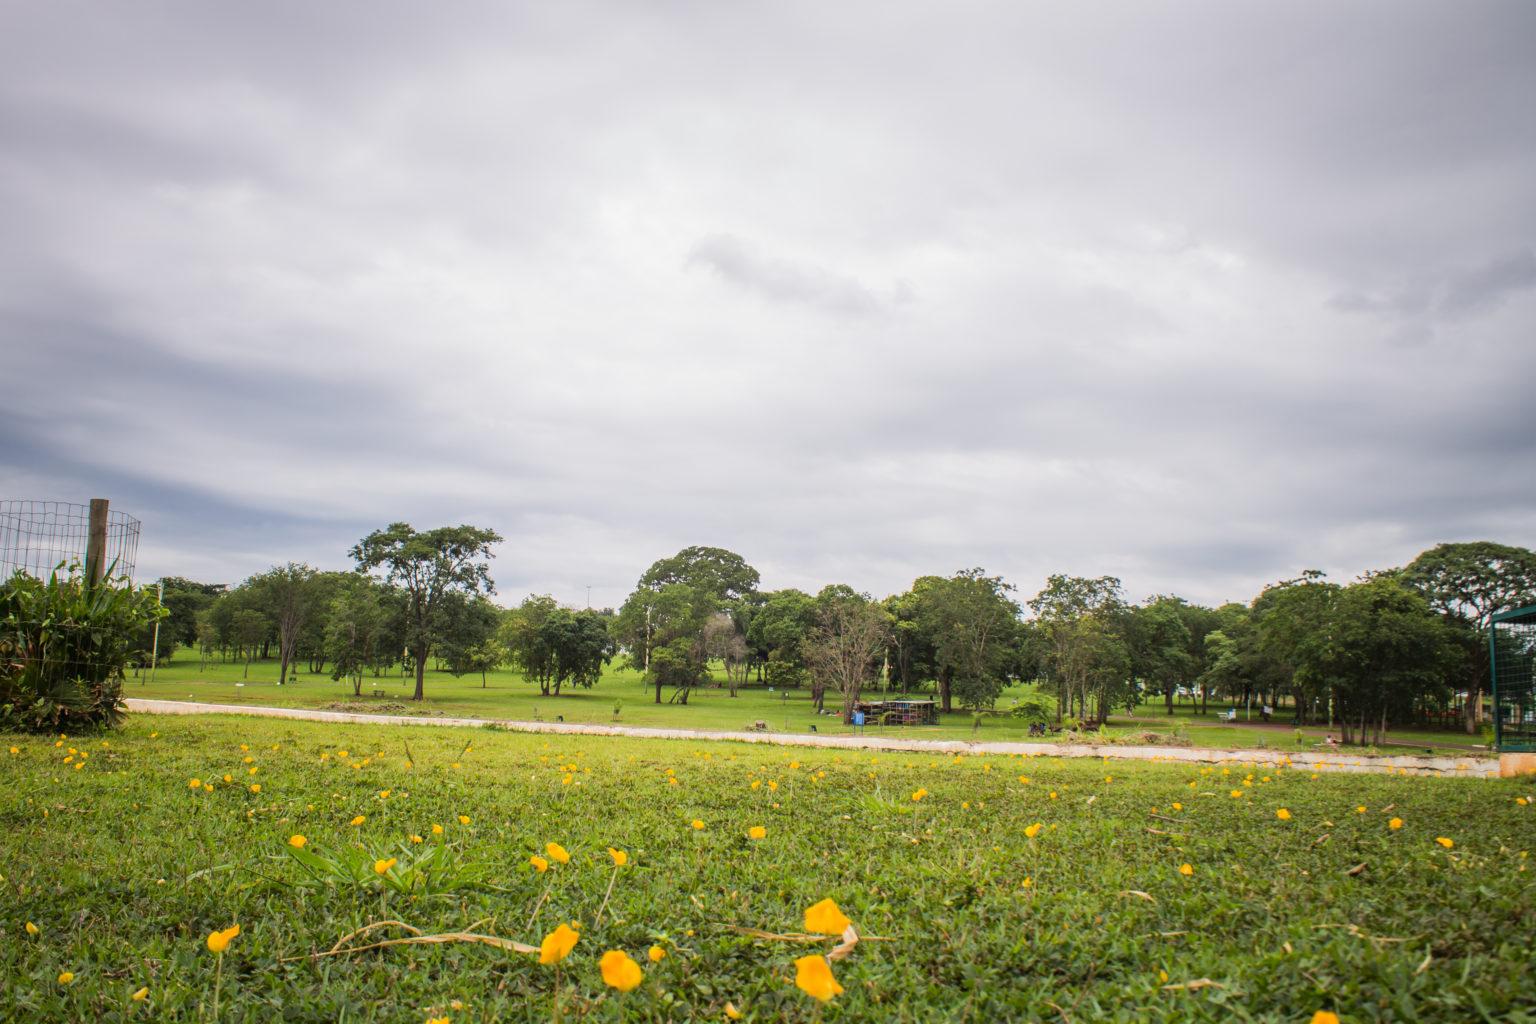 Walking tour in Campo Grande